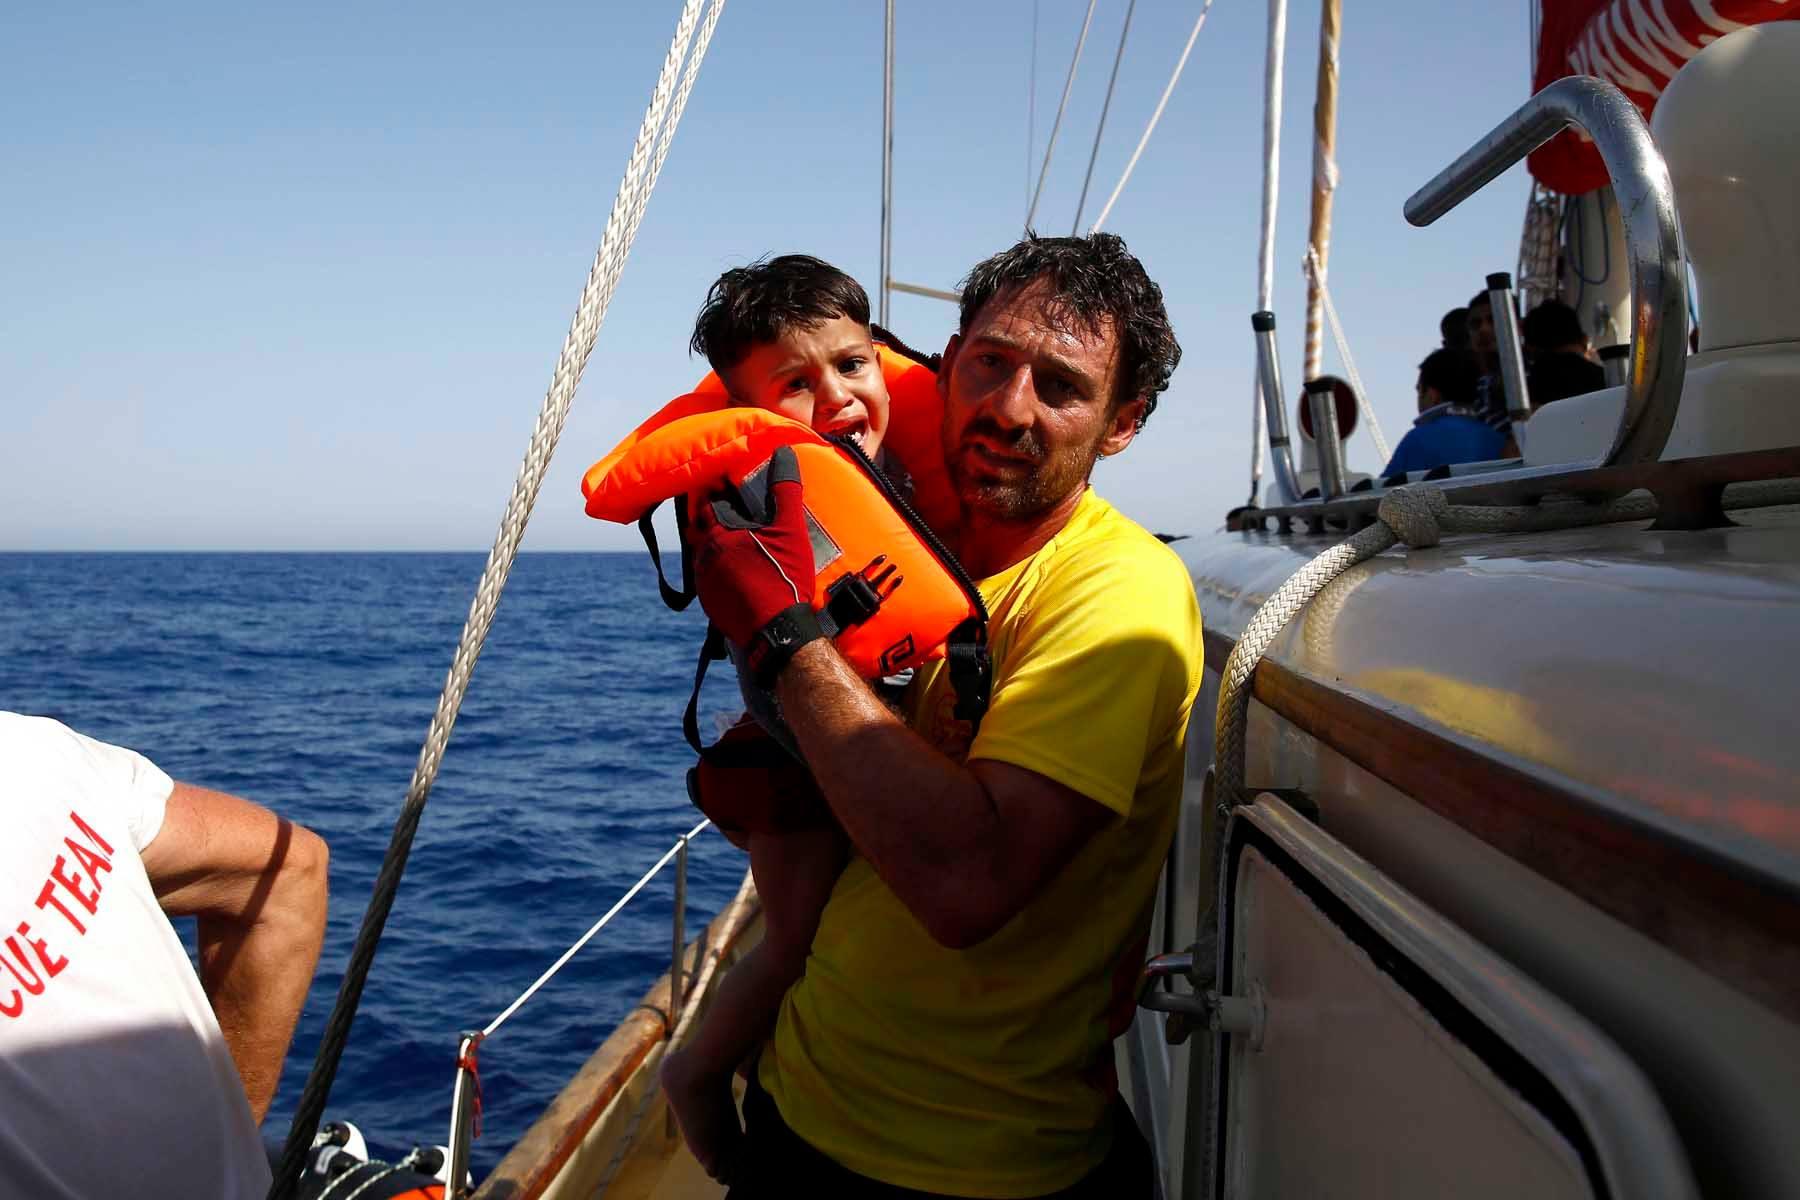 Oscar Camps Proactiva en LaCafeteraEuropaIndigna